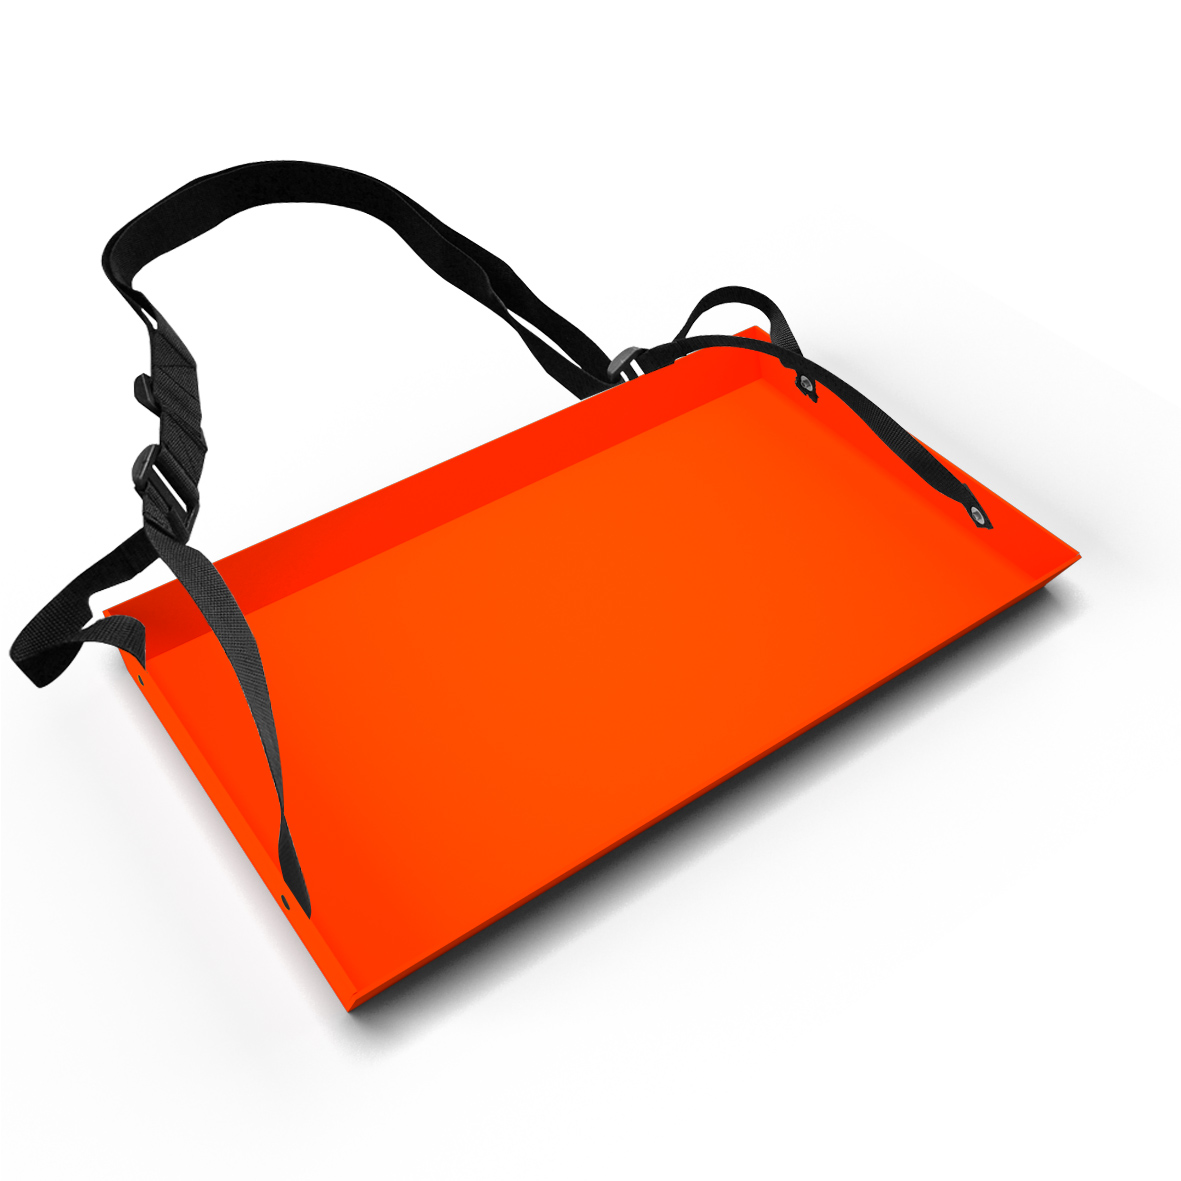 POP-LAYS-Promo-Berretto-JT160415-orange – Kopia